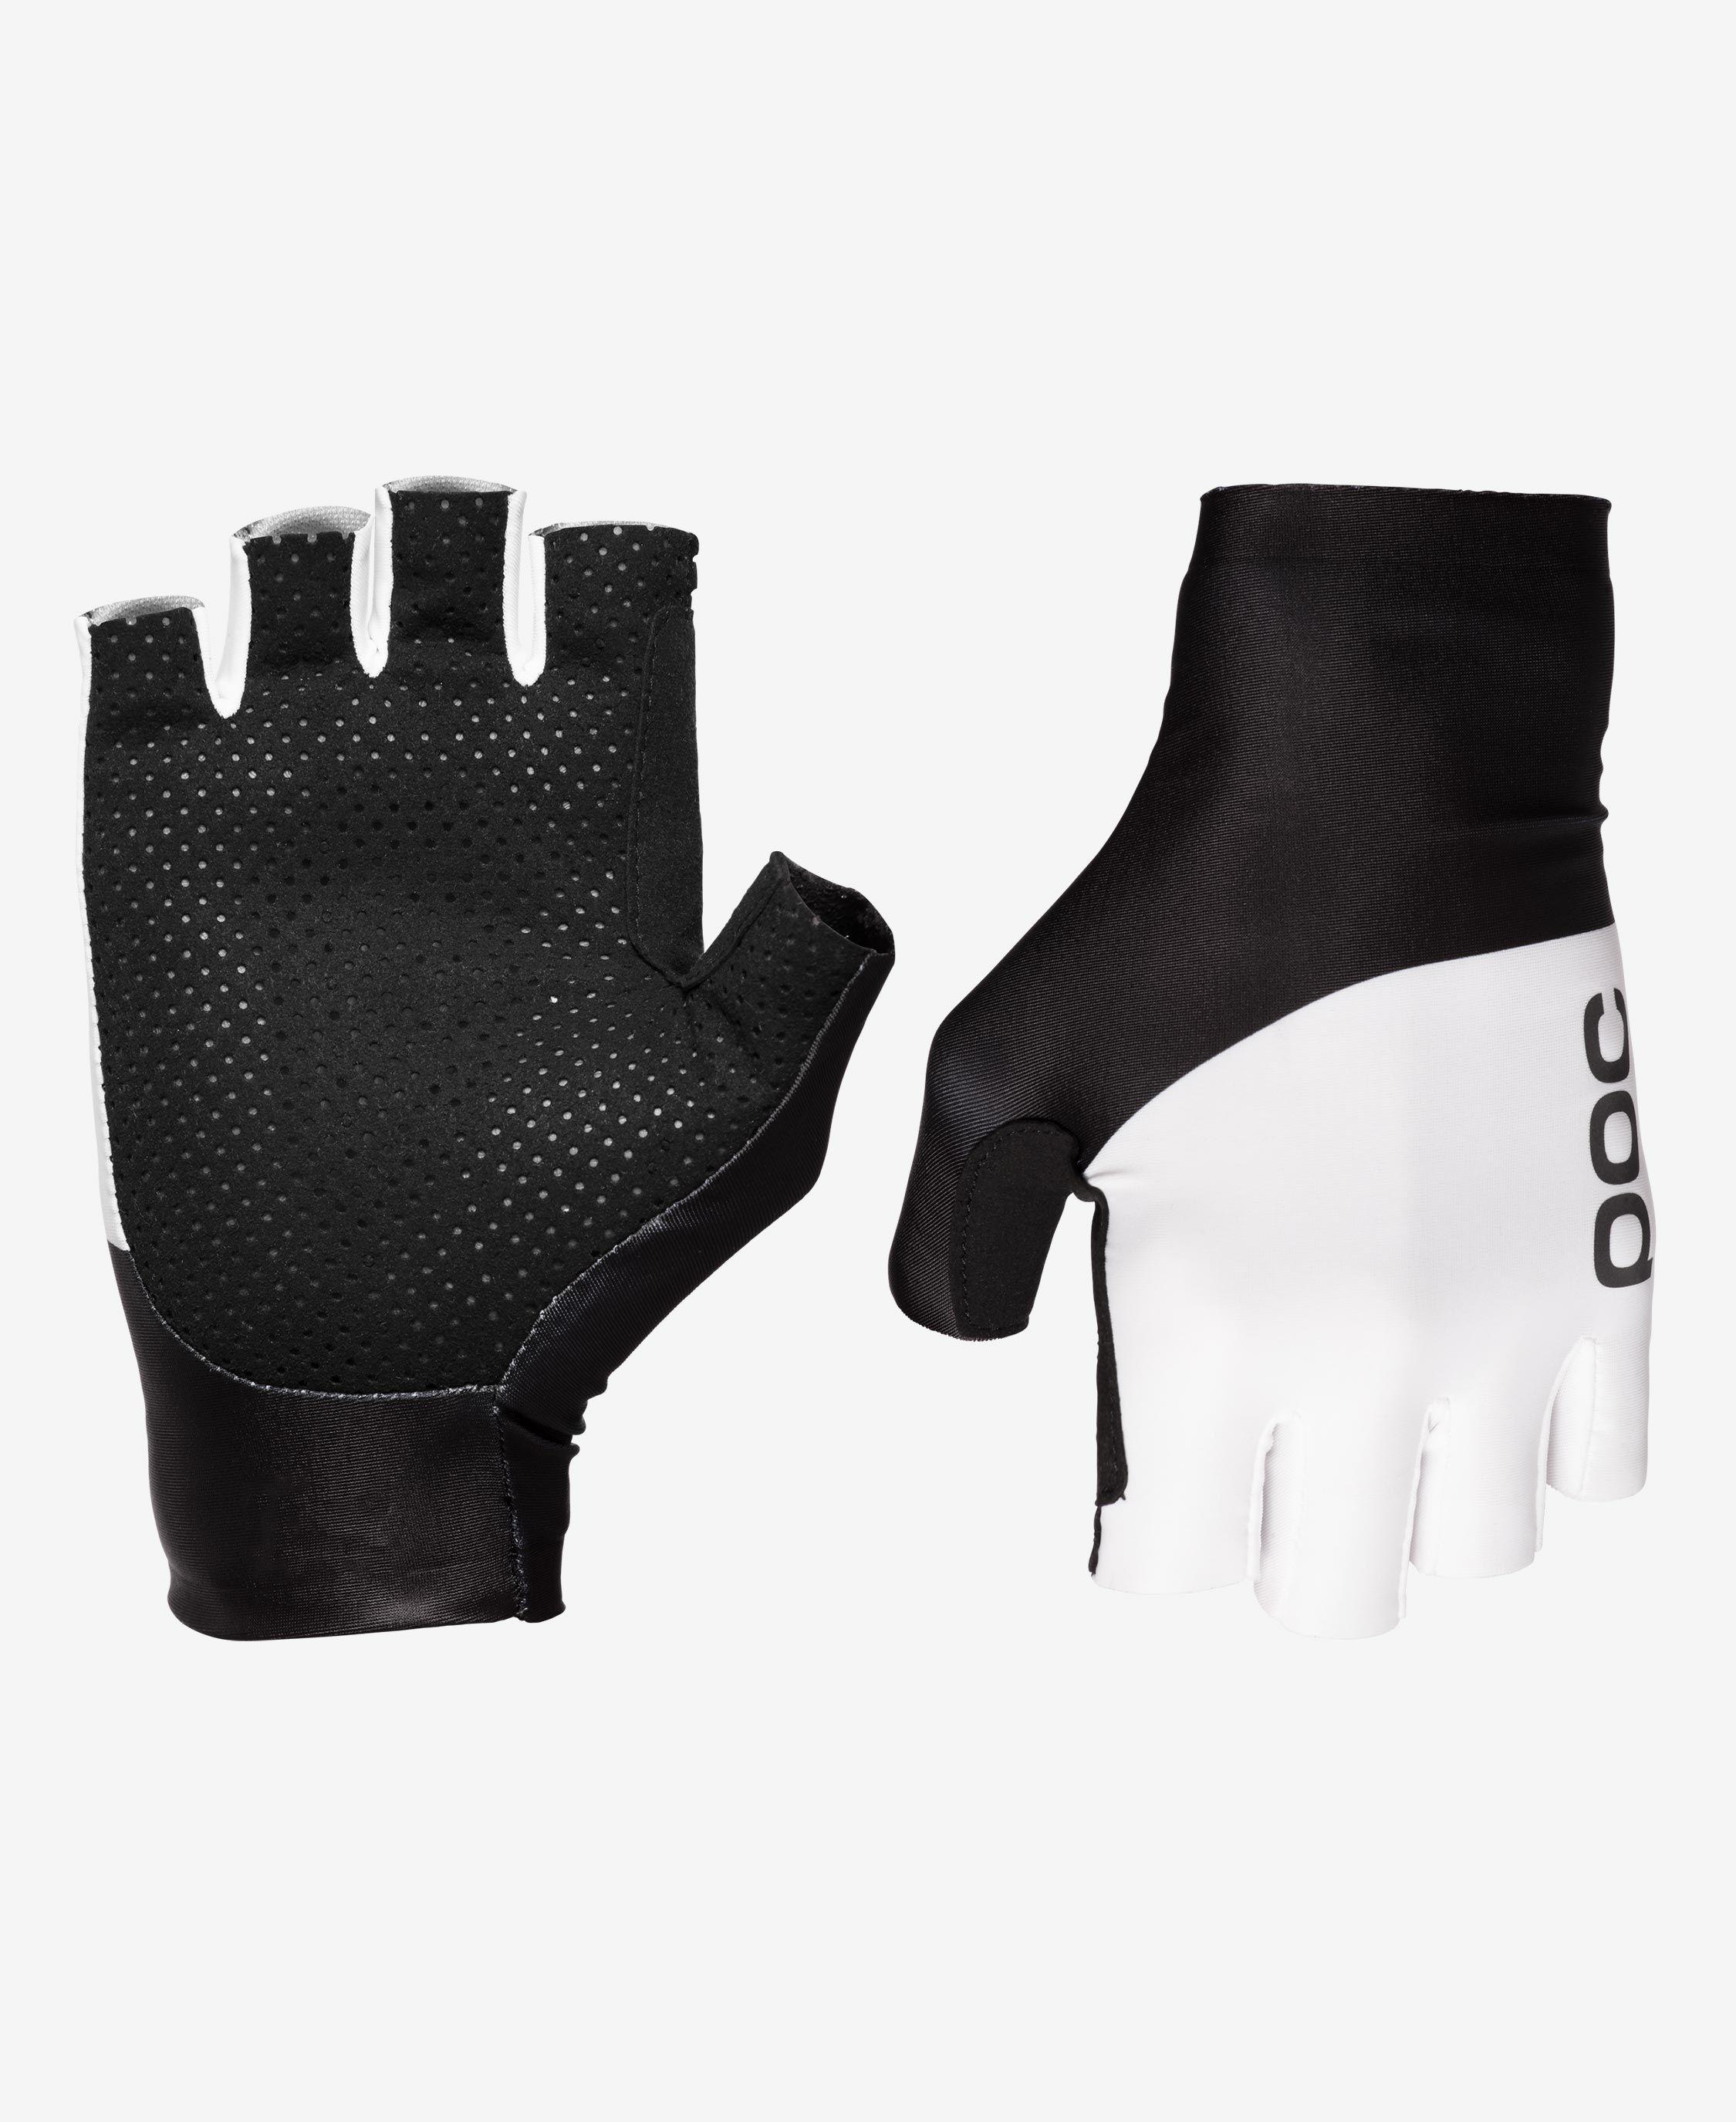 Poc Raceday Aero Gloves 2019 | Handsker